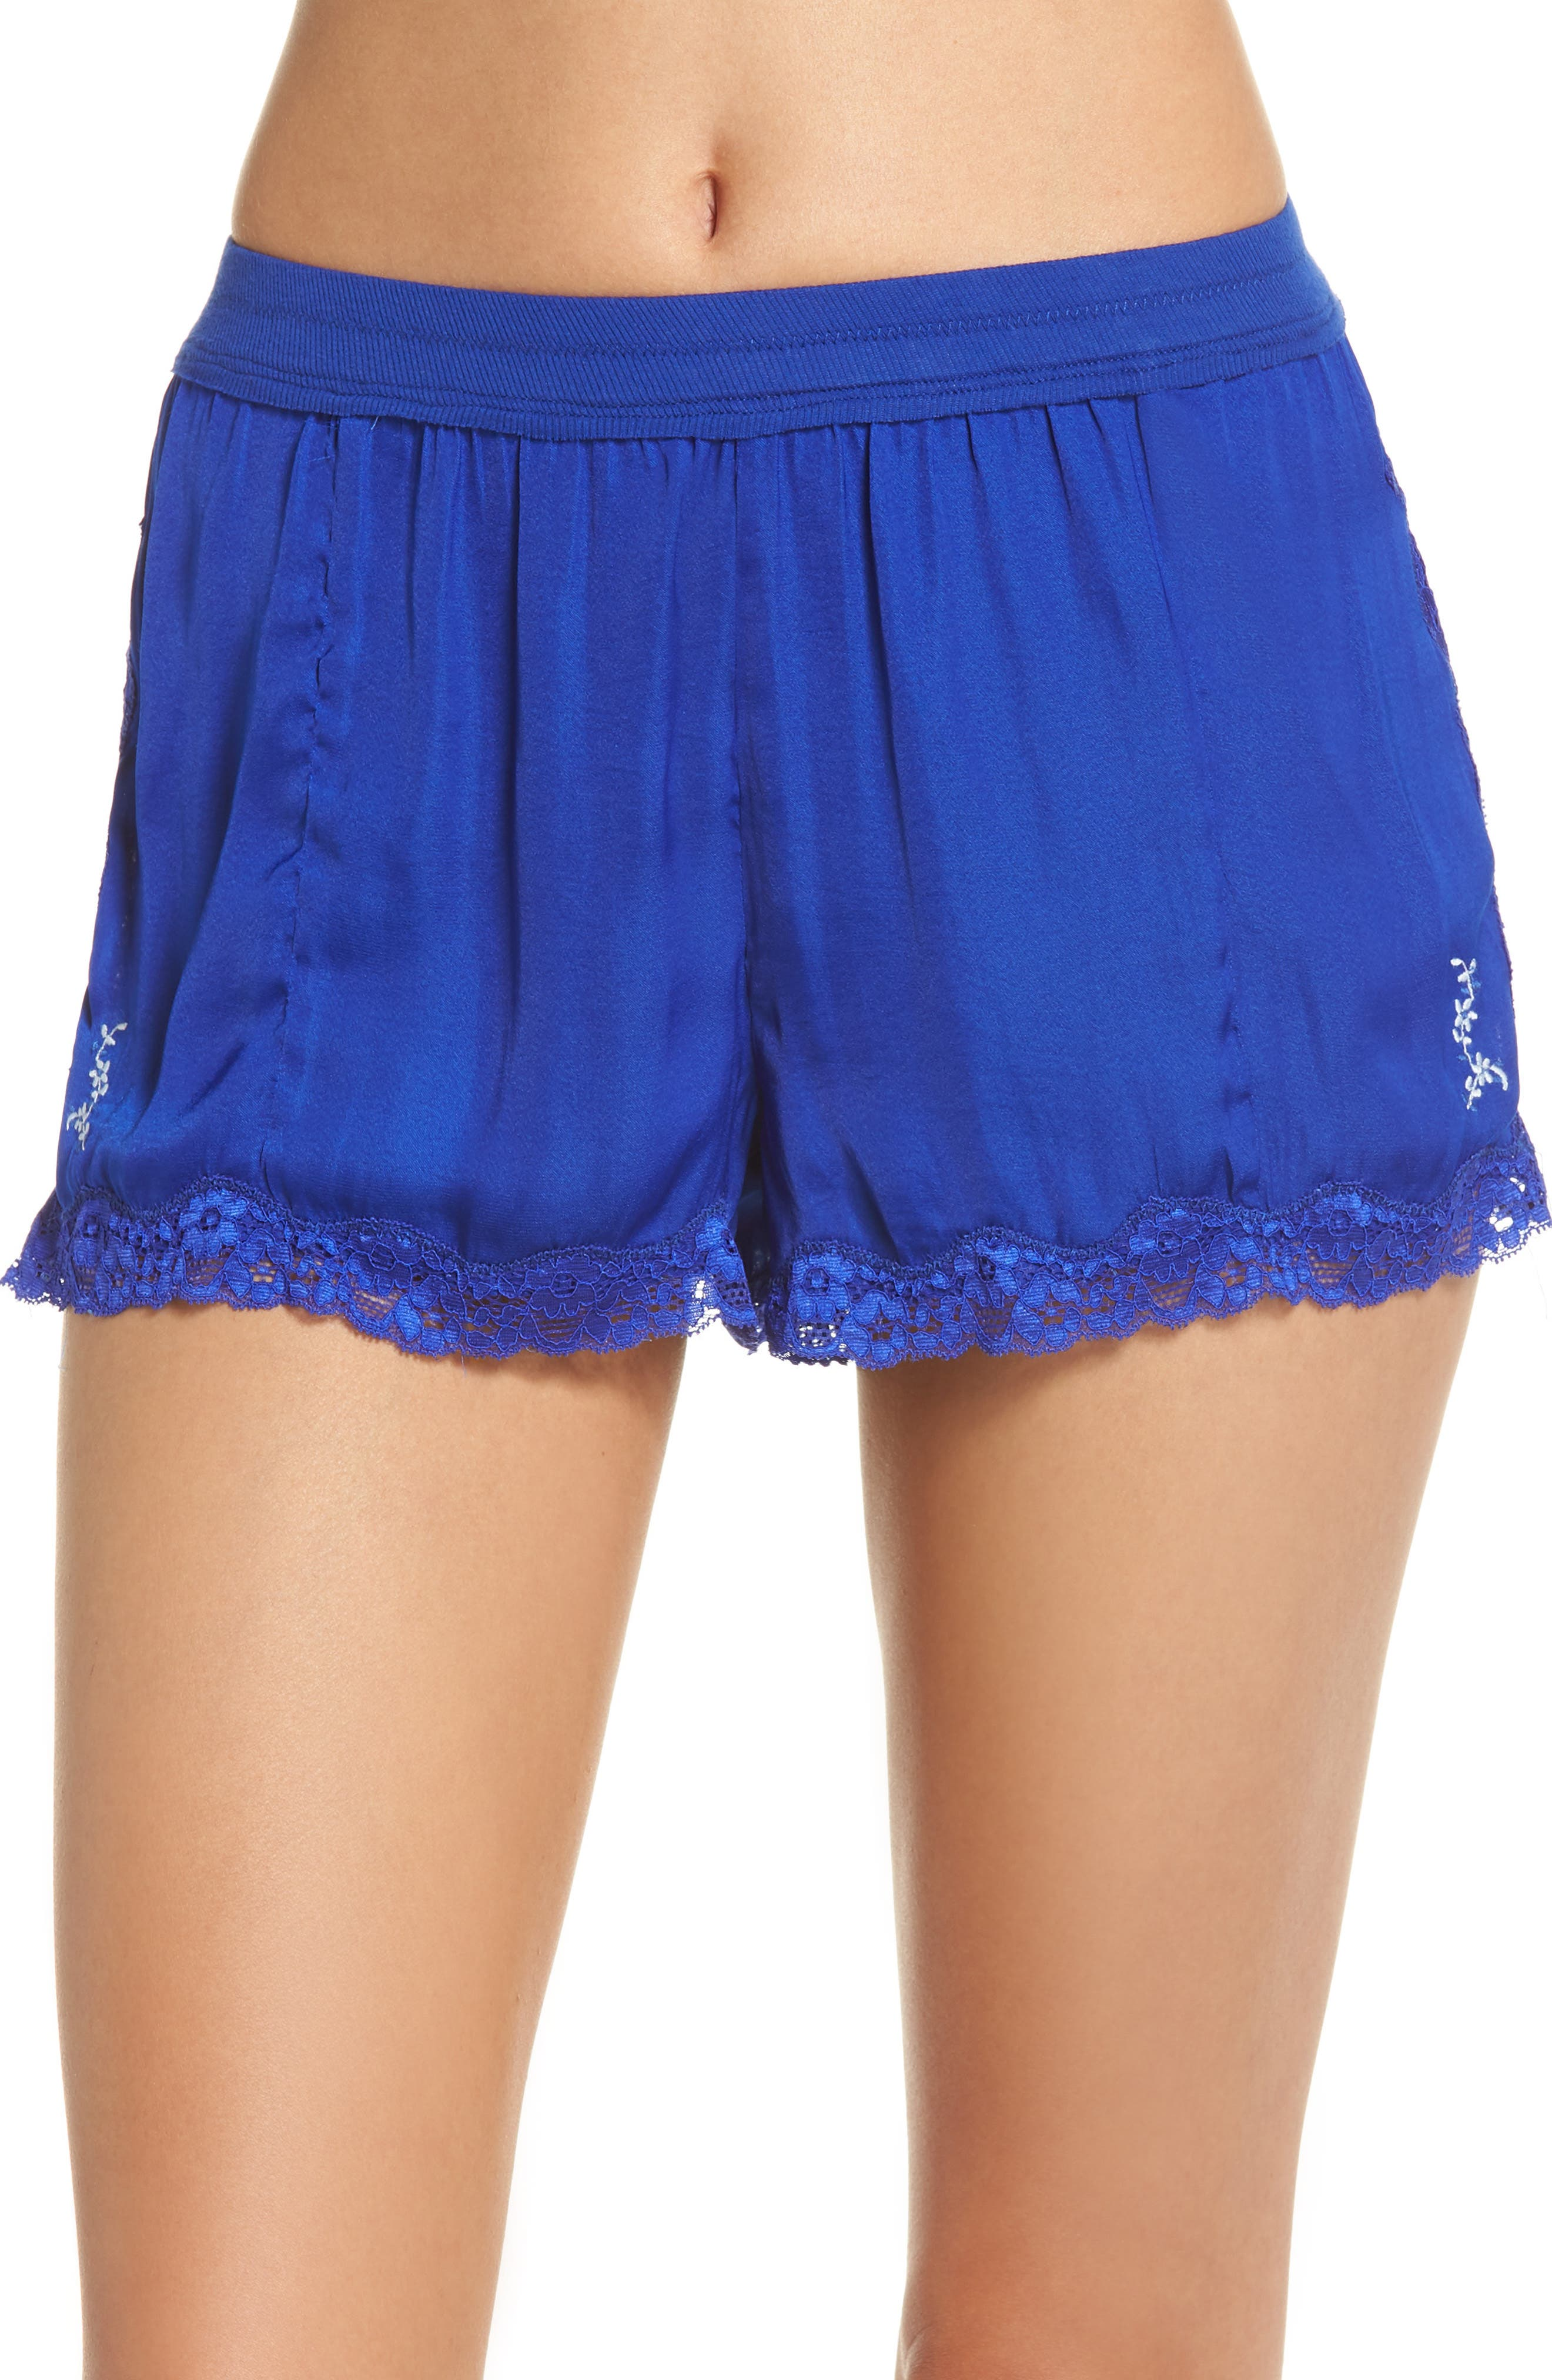 Intimately FP High Side Shorts,                             Main thumbnail 1, color,                             400